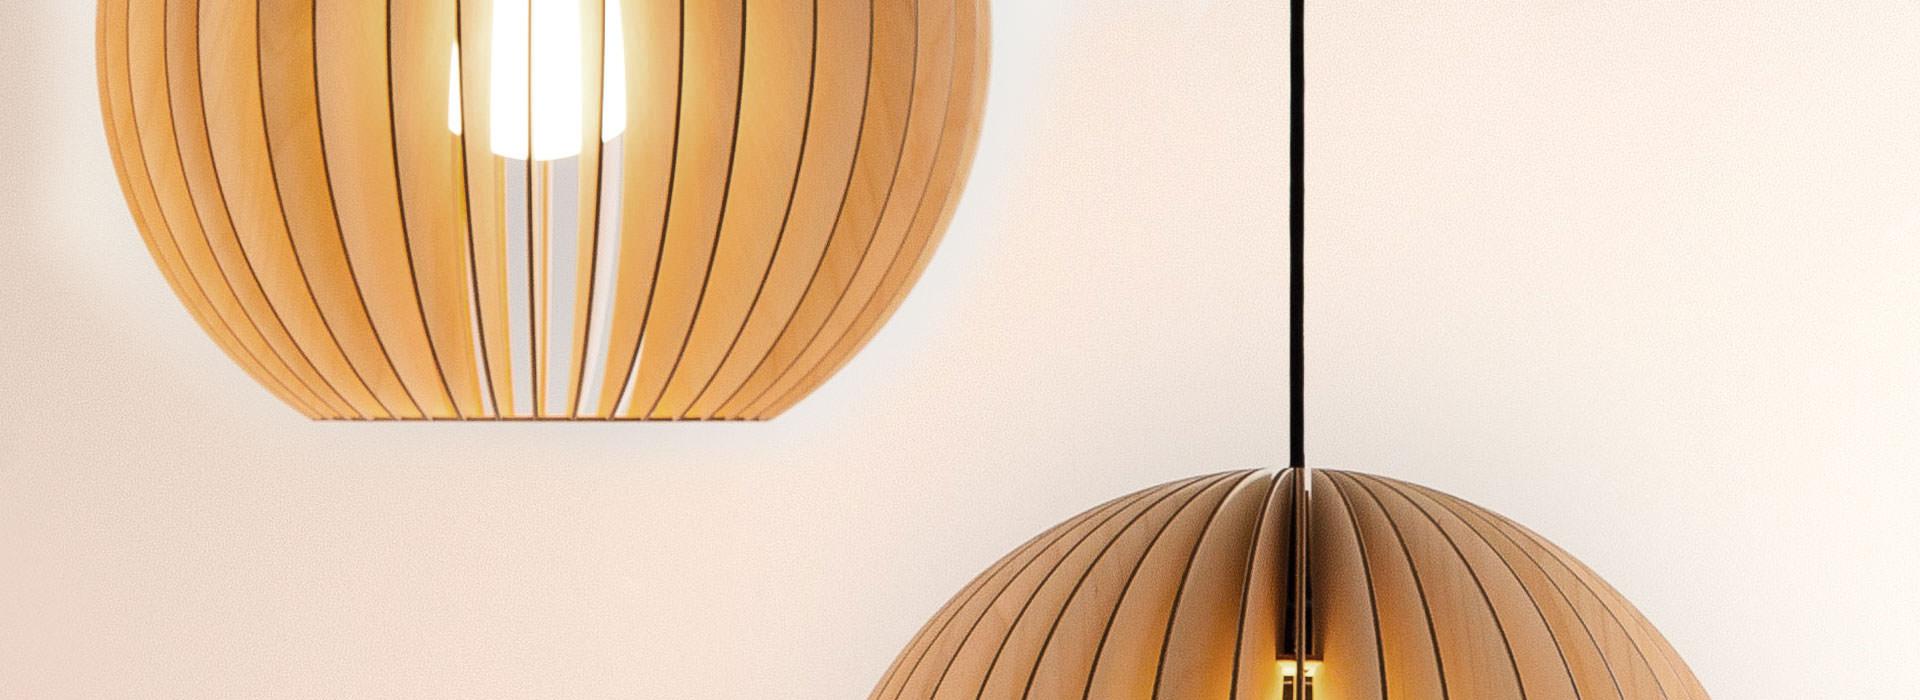 Iumi design lampen aus holz aion40 1920x700 iumi design for Lampen aus holz